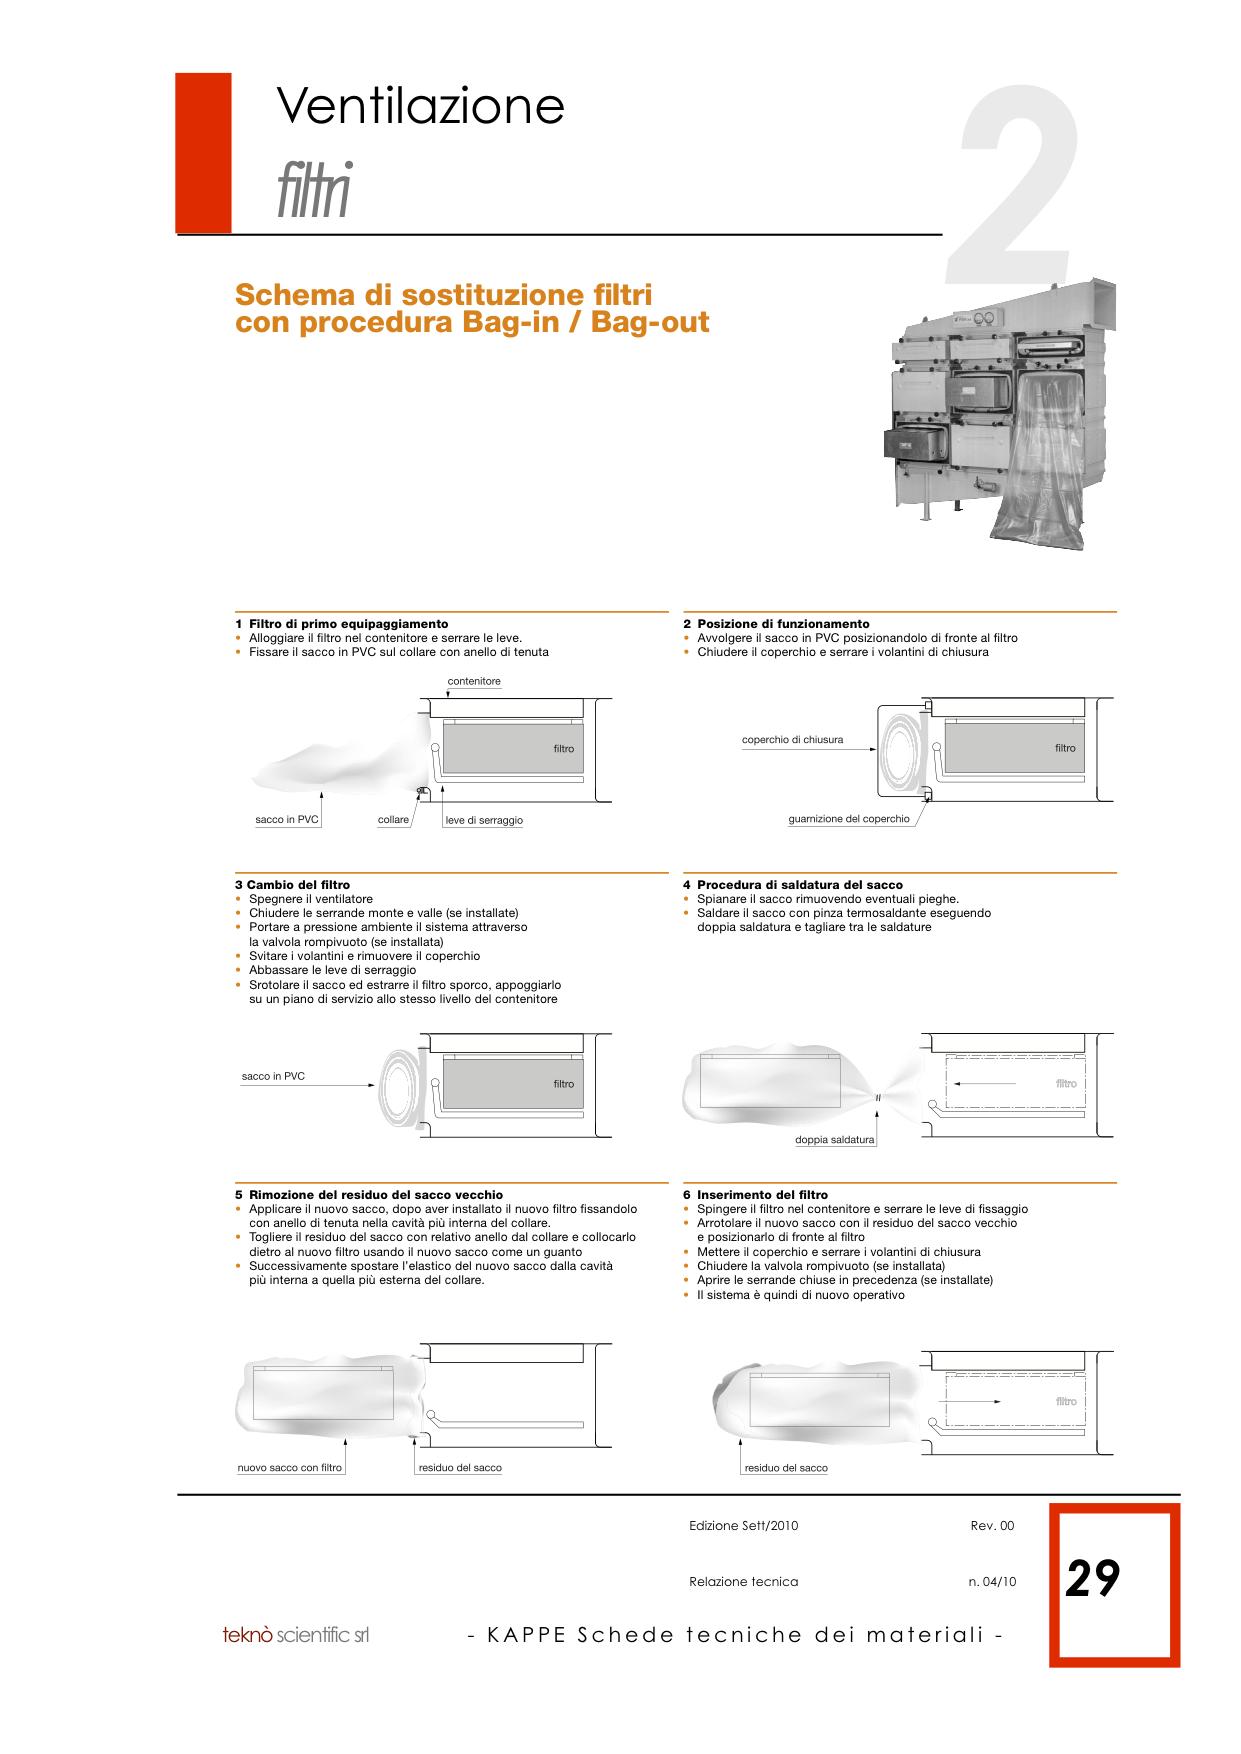 KAPPE Schede tecniche materiali copia 9.png